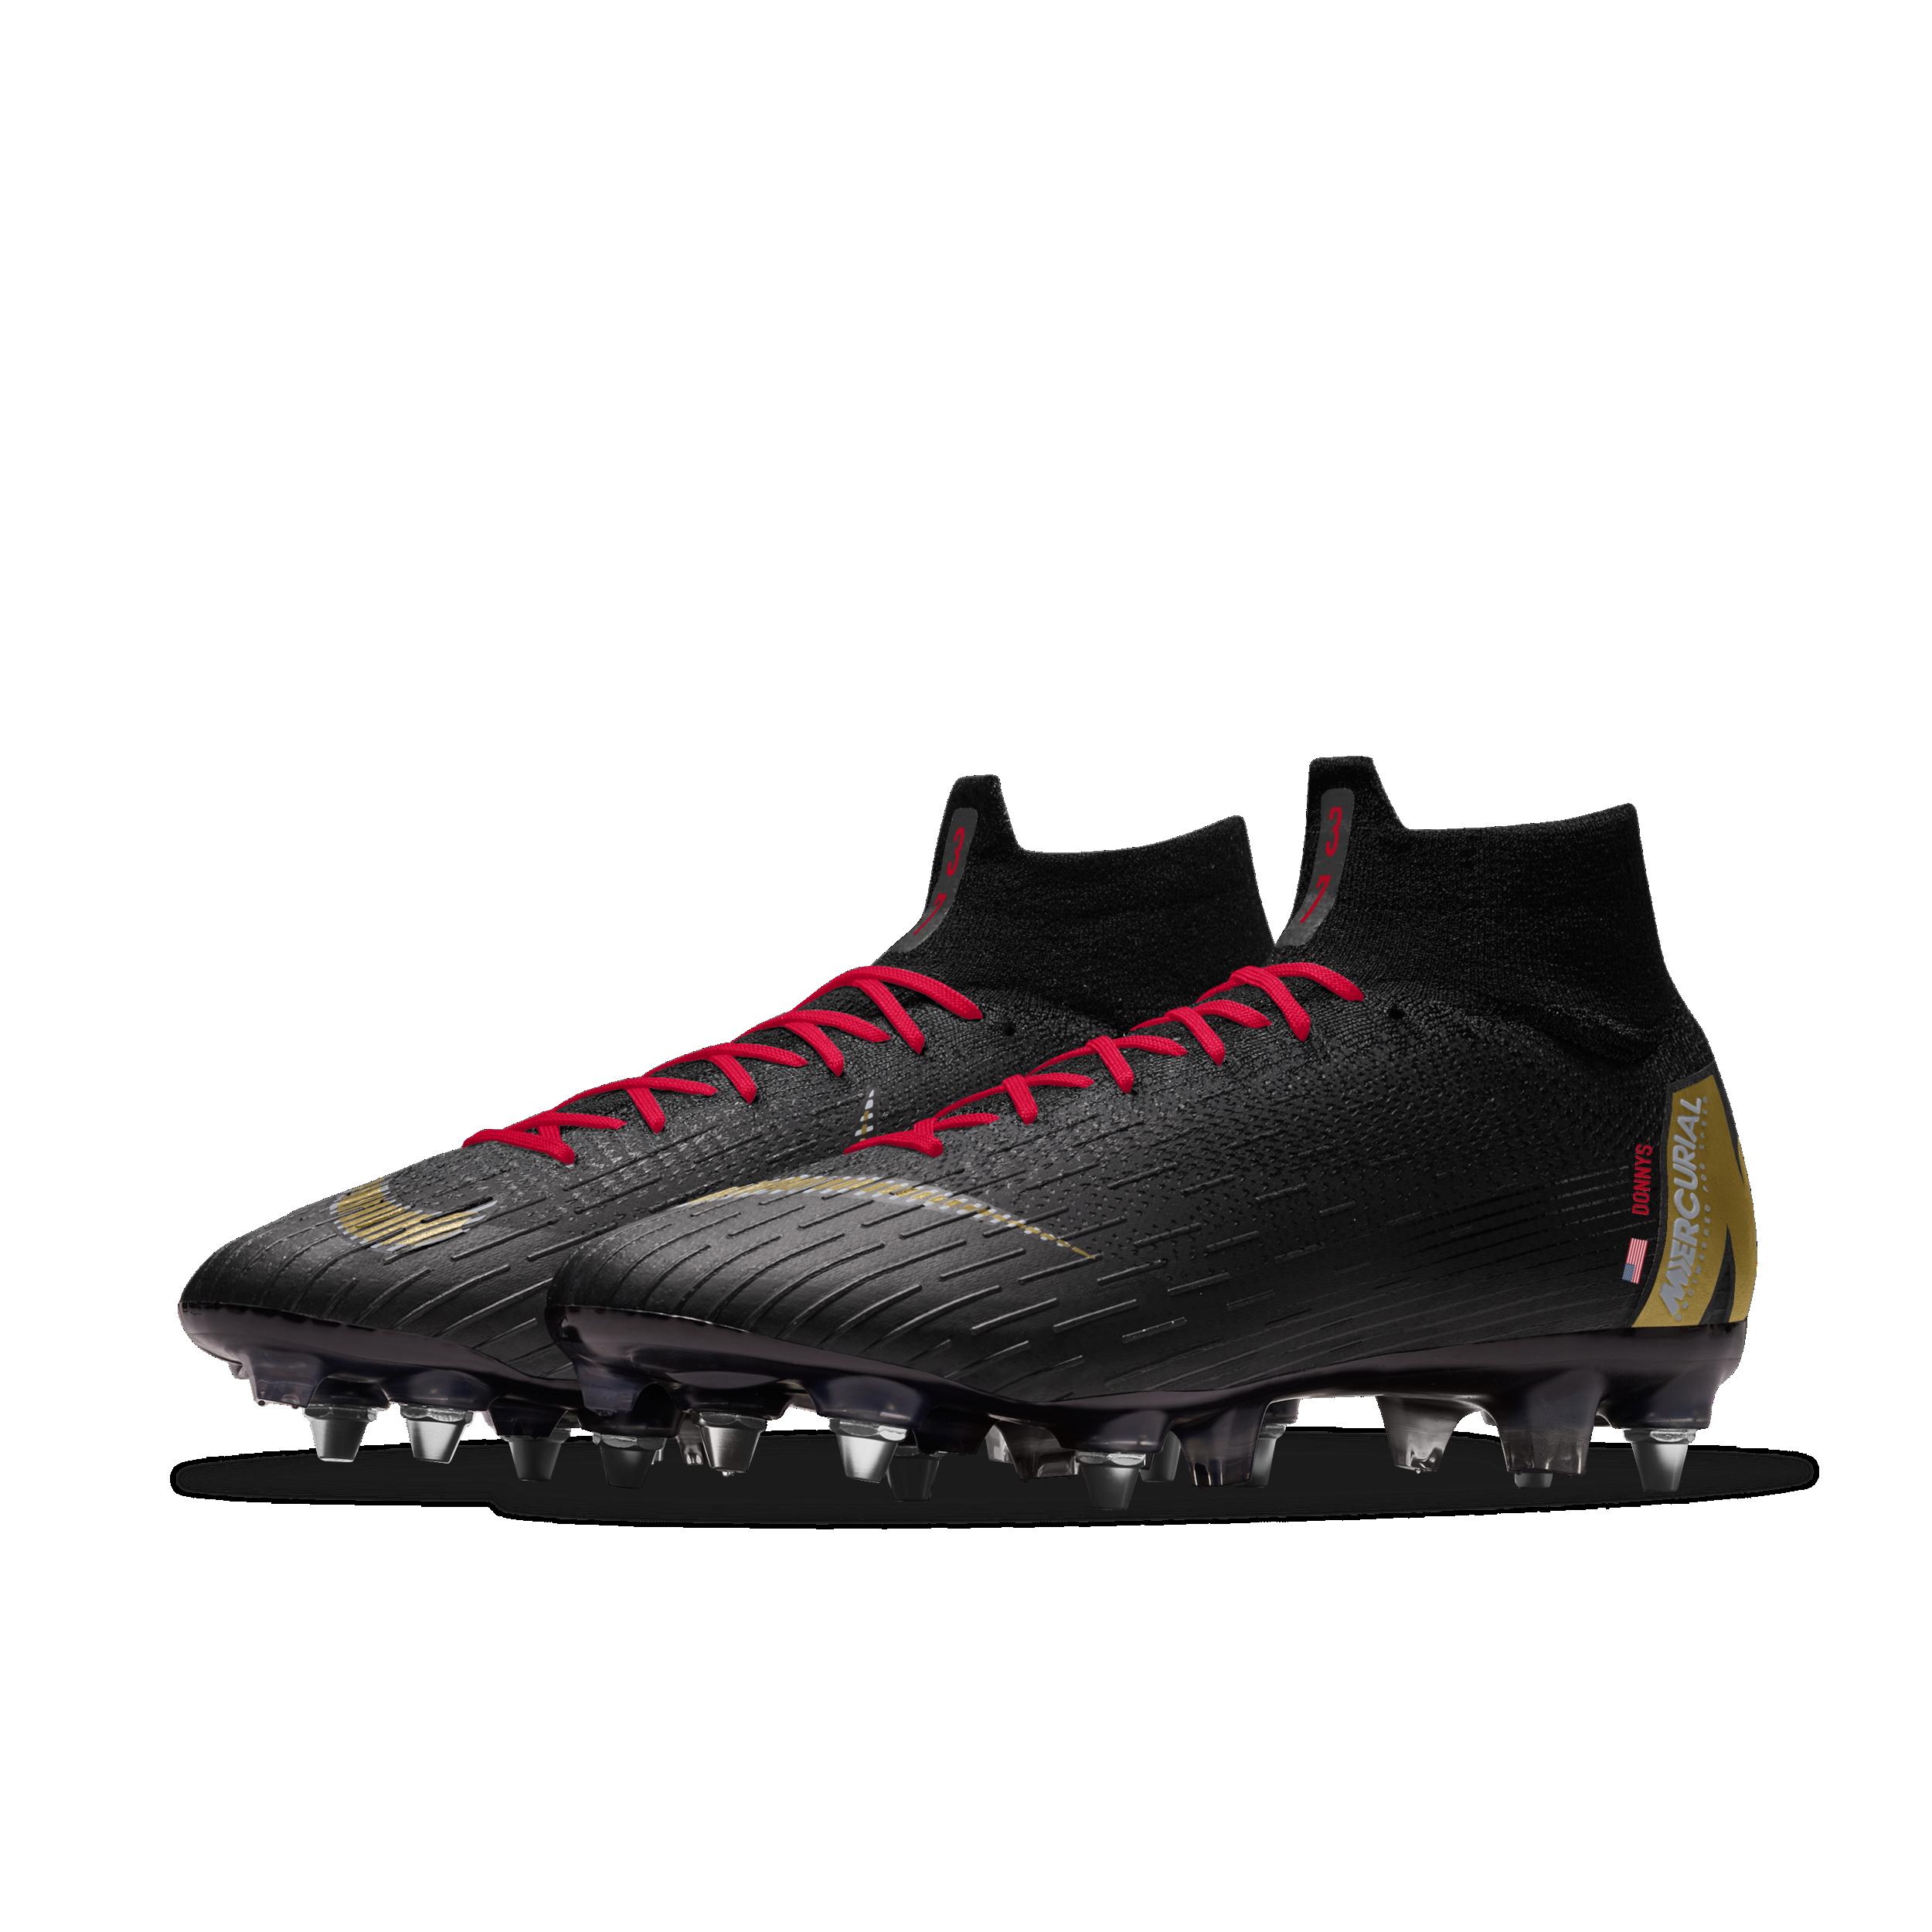 efb36616c8c25  football  soccer  futbol  nikefootball Nike Mercurial Vapor 360 Elite FG  Rising Fire - Team Red   Bright Crimson   Metallic Dark Grey